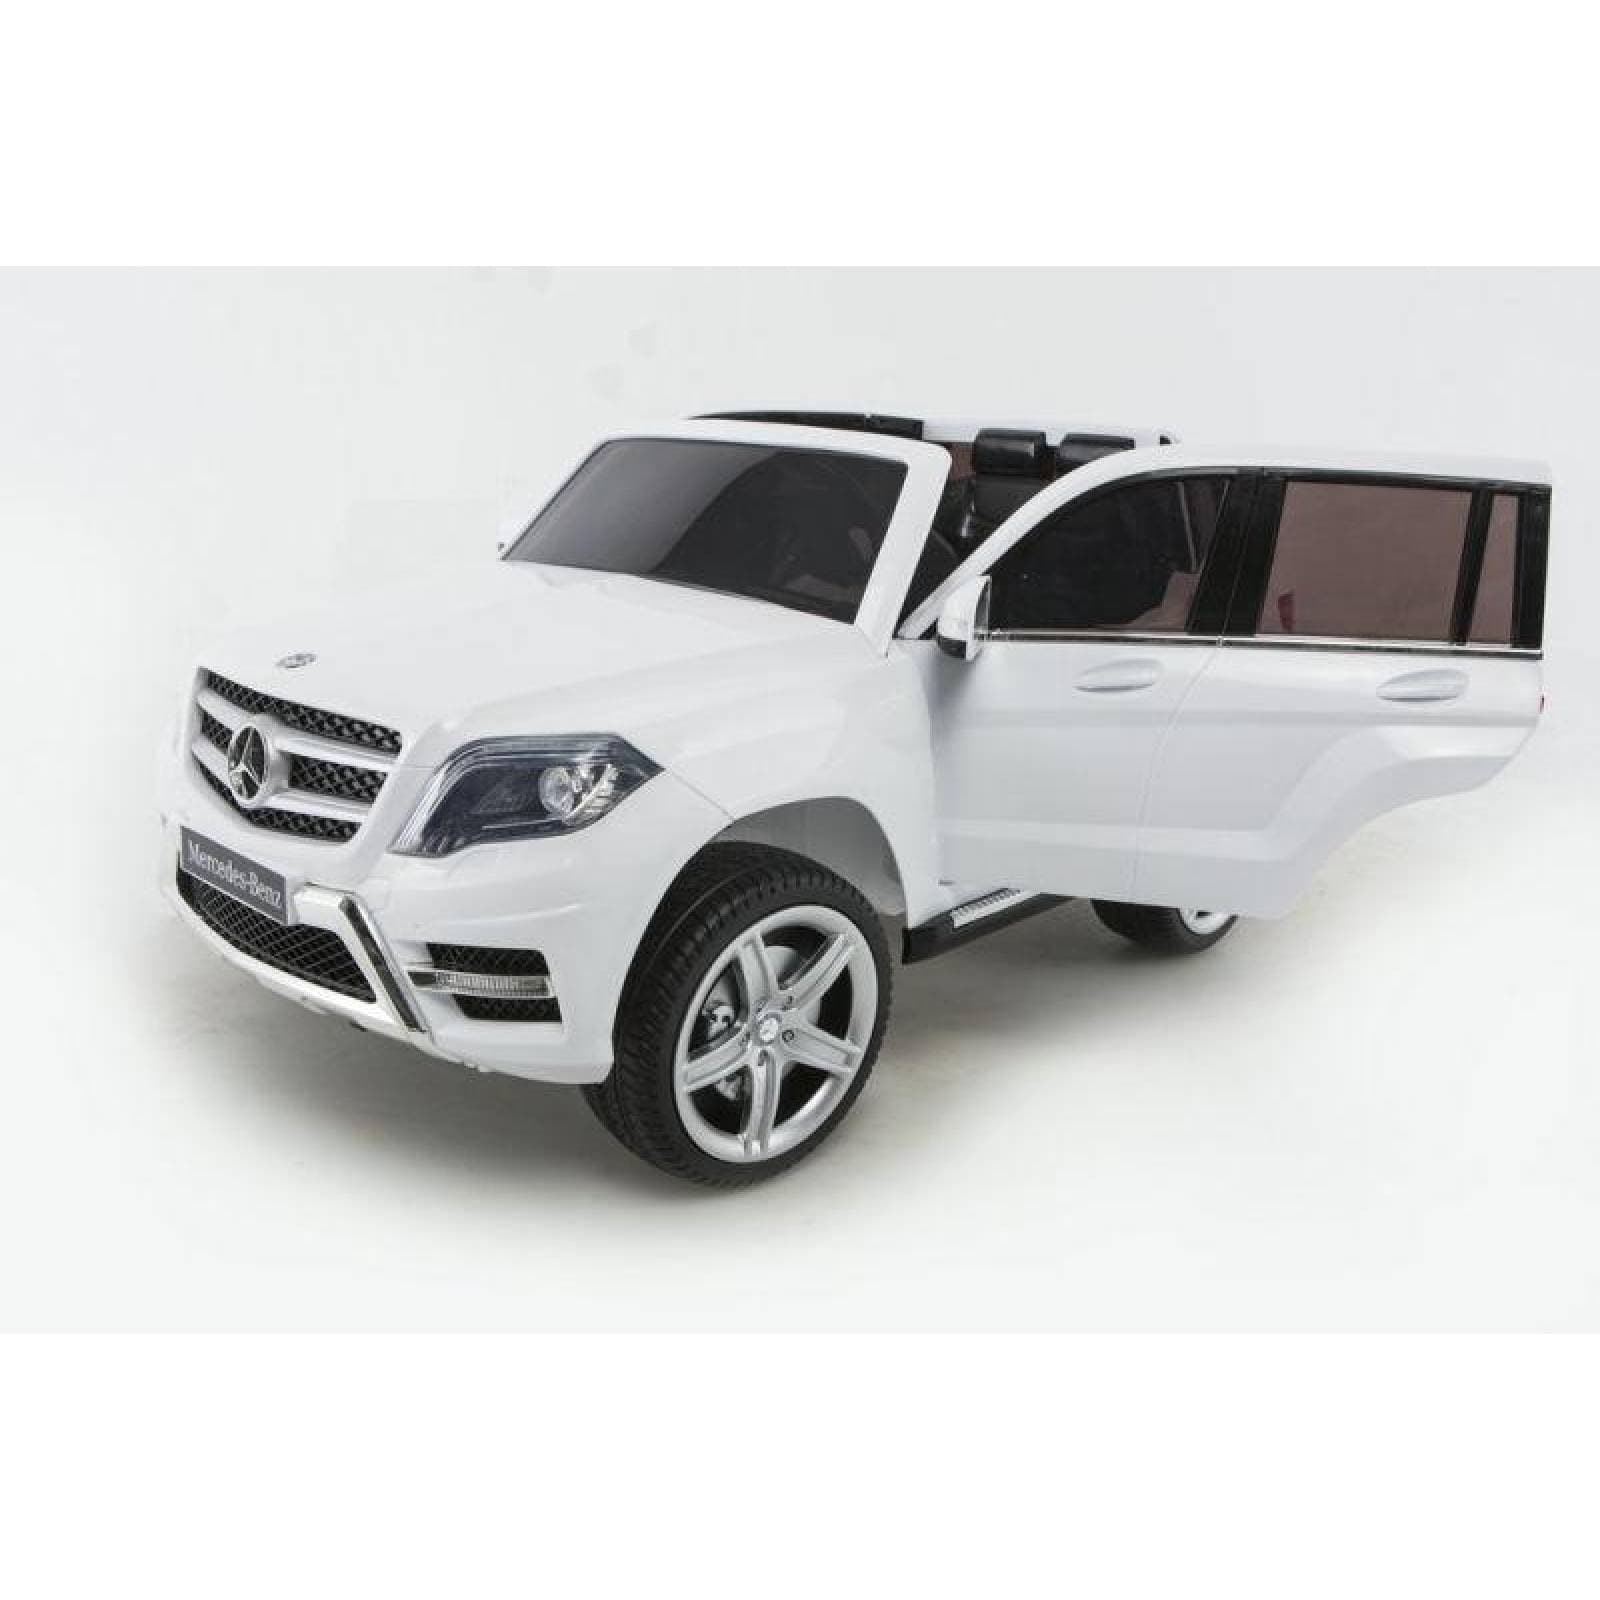 Camioneta Montable MercedesBenz GLK Con Pintura Automotriz